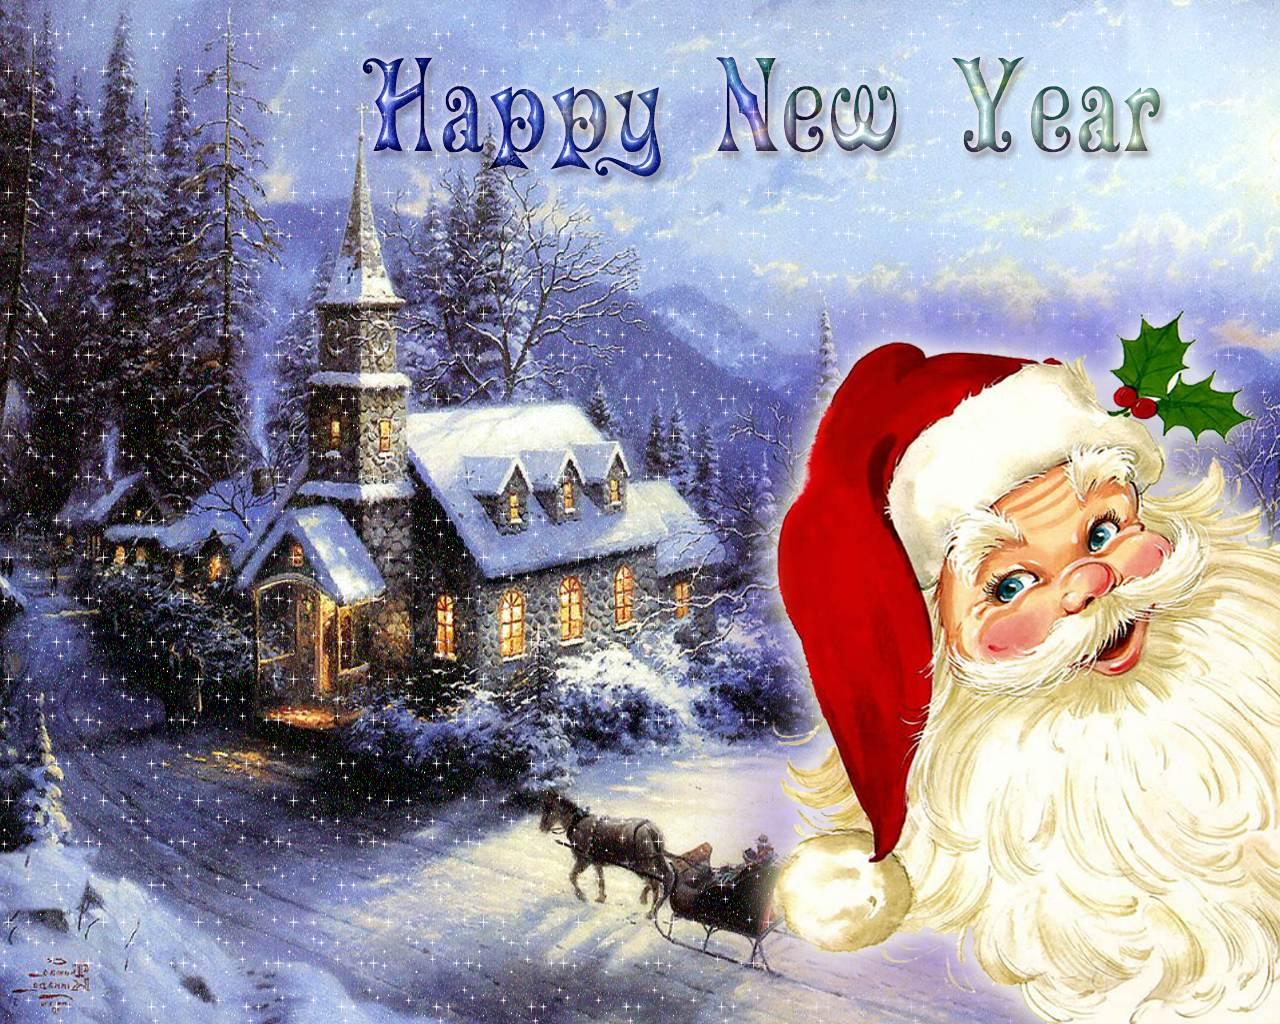 s1600freehdchristmaswallpaper Christmas Wallpapers 5jpg 1280x1024